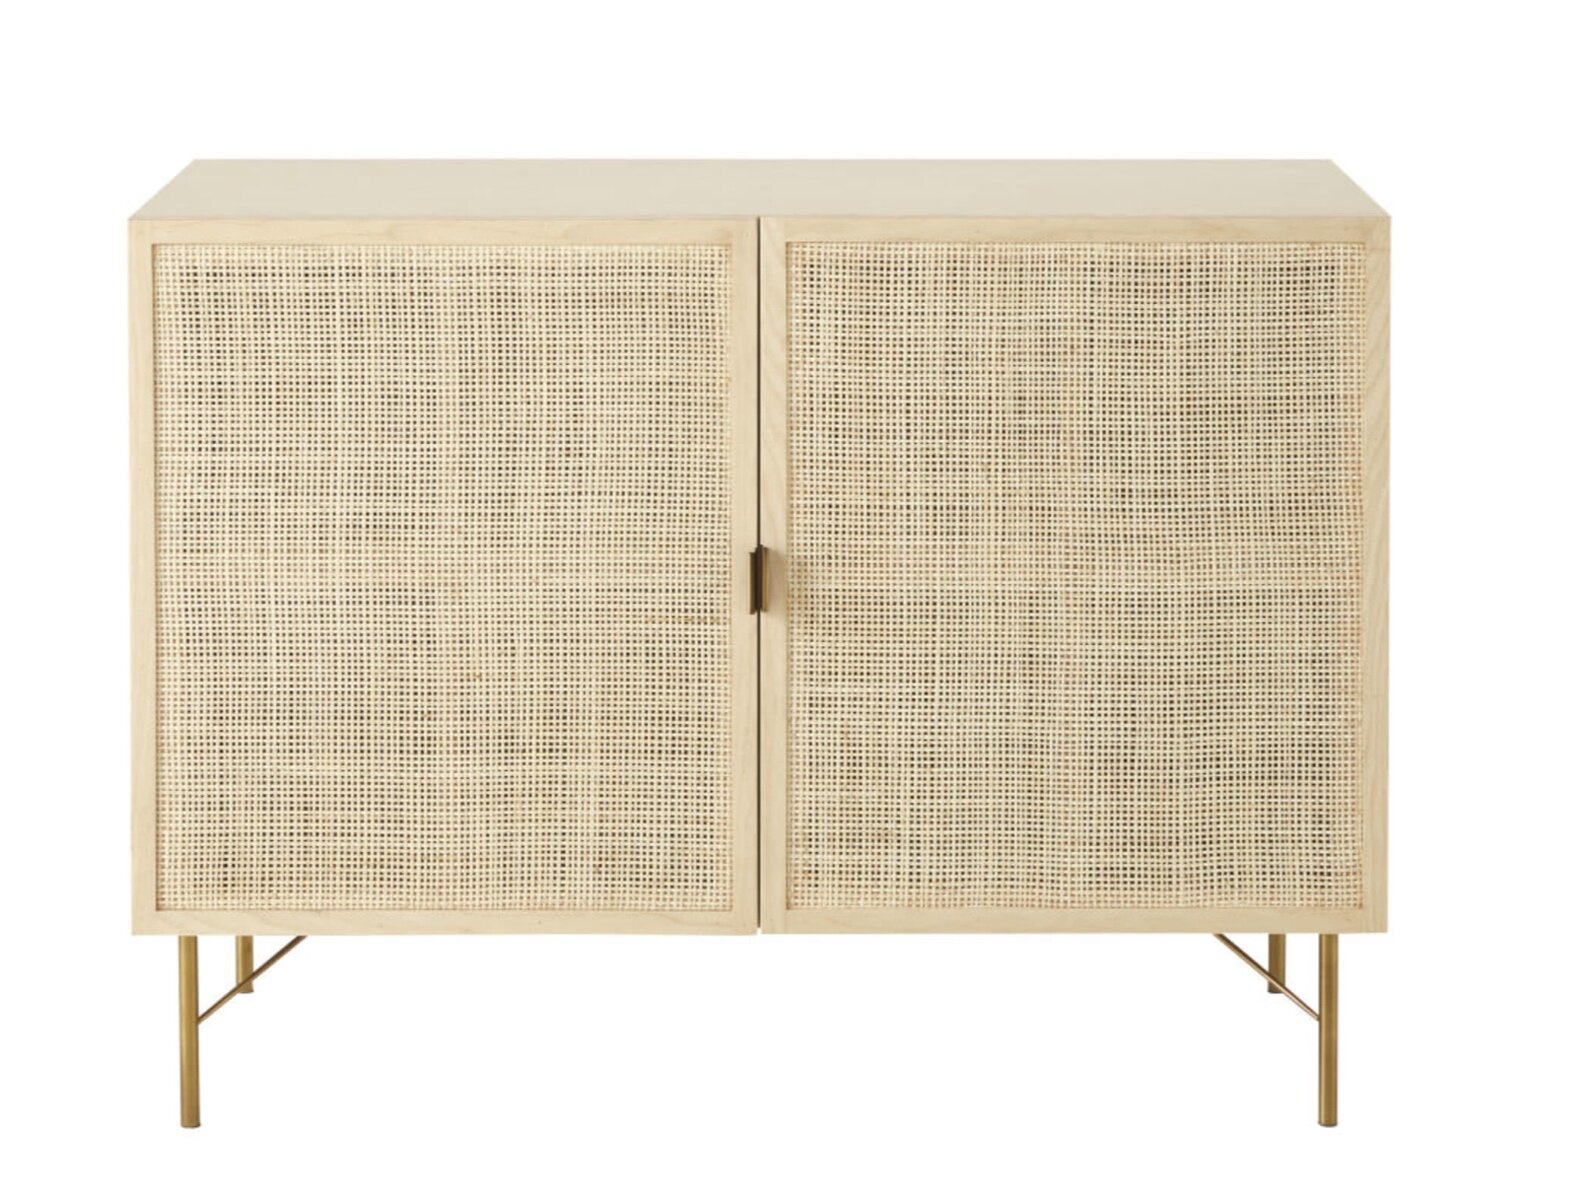 SOLSTICE Woven Sideboard, Maisons Du Monde £248